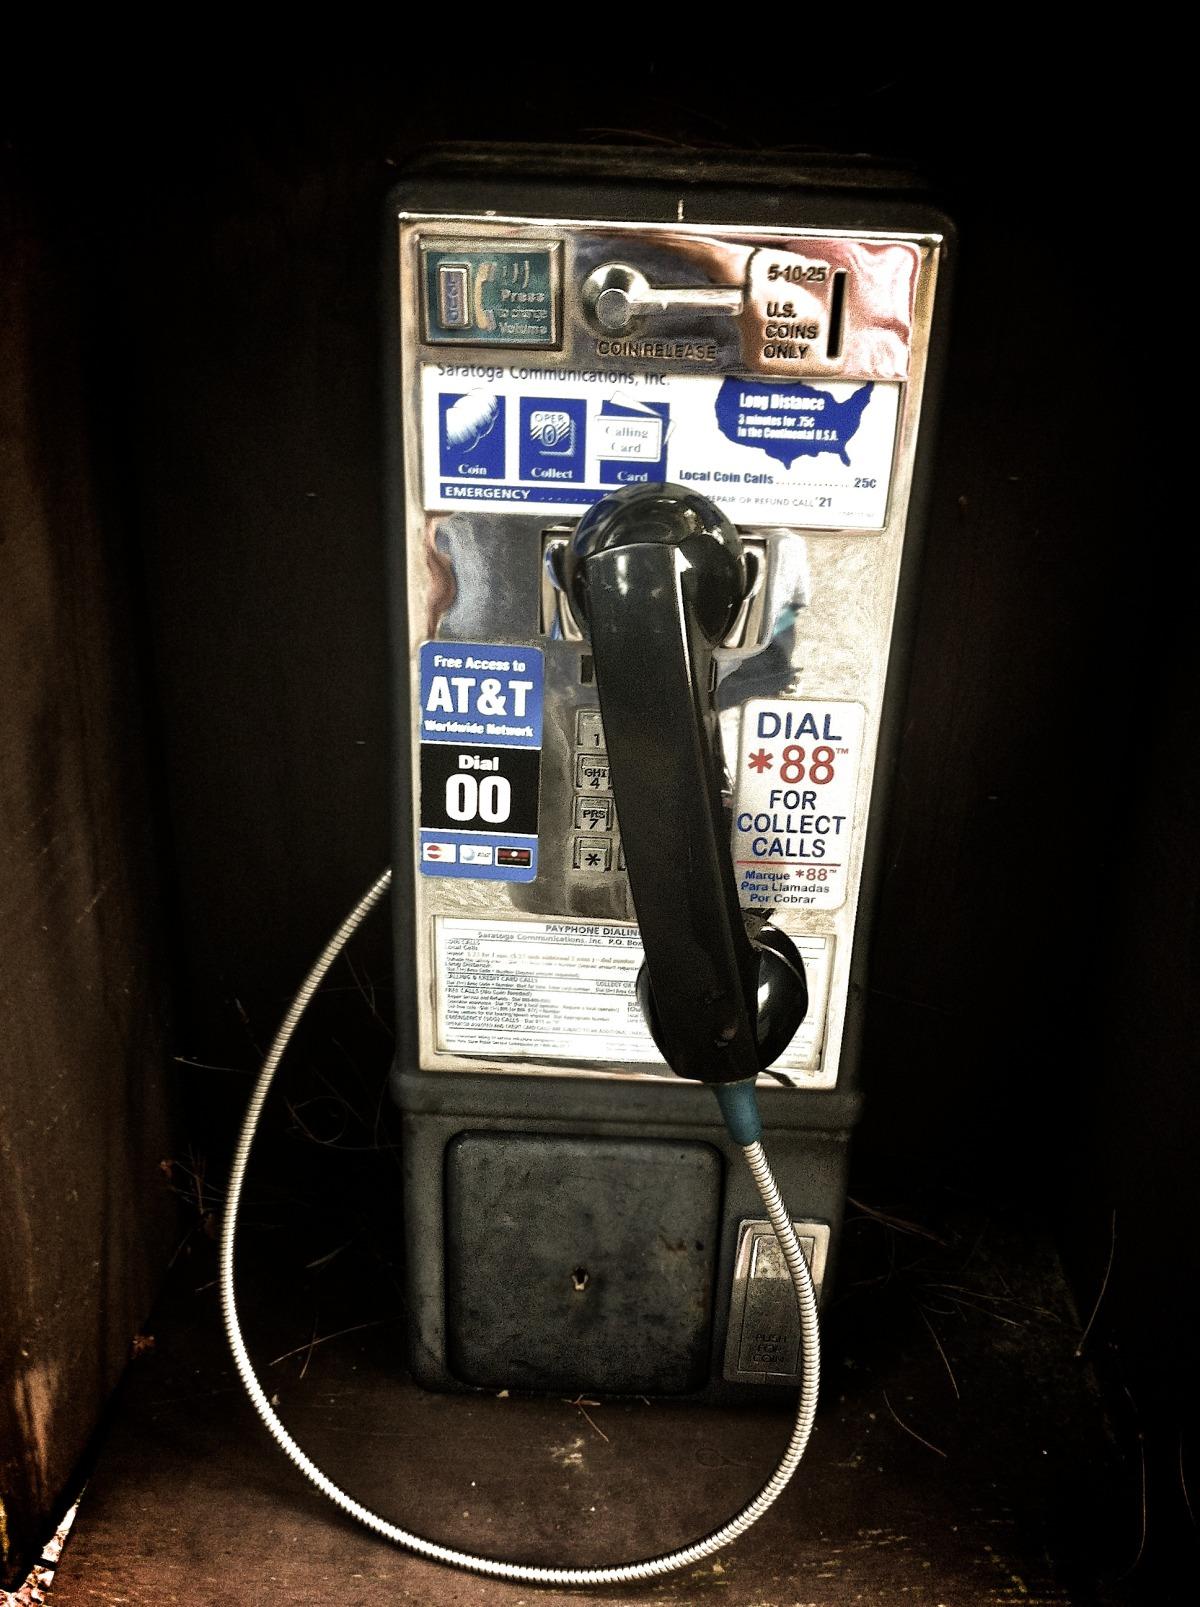 payphone 9.17 upload 1.jpg